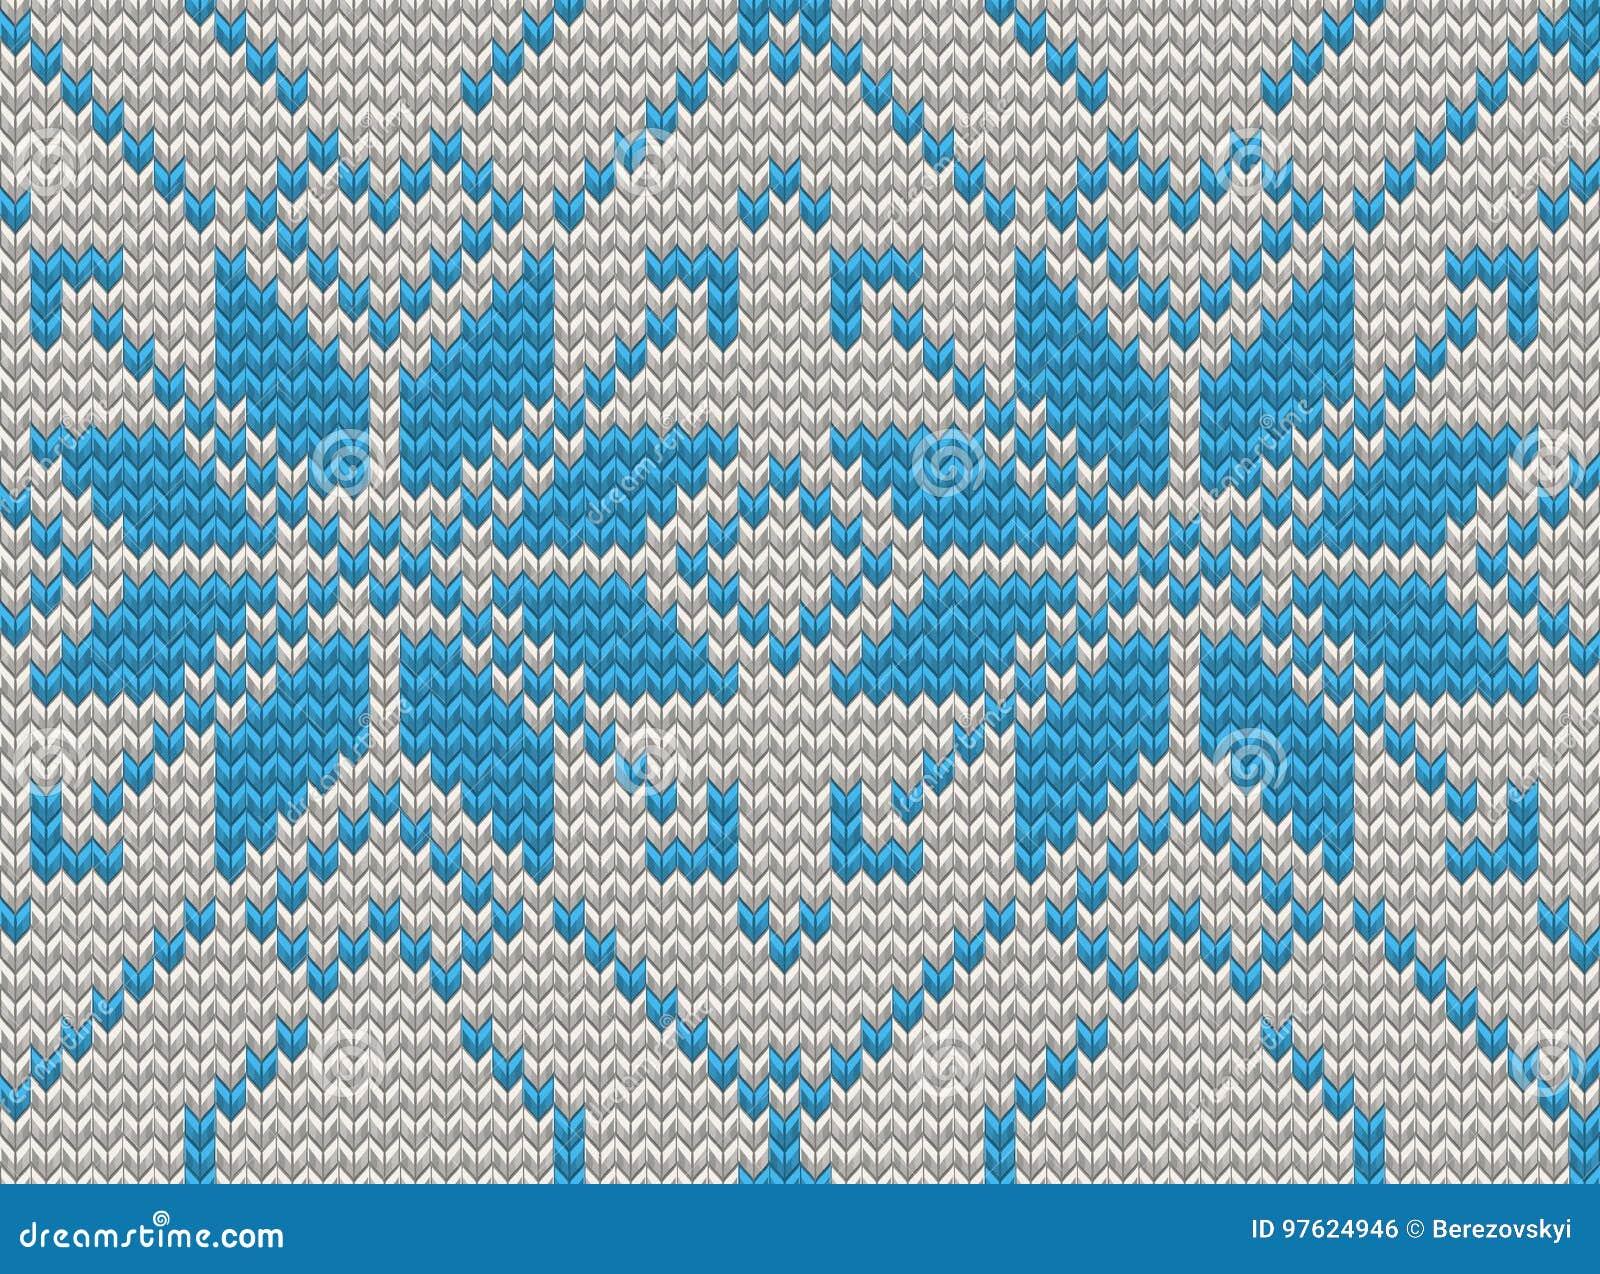 20281d7d3bde Seamless Knitting Pattern Christmas Sweater Design. EPS 10 Vector ...